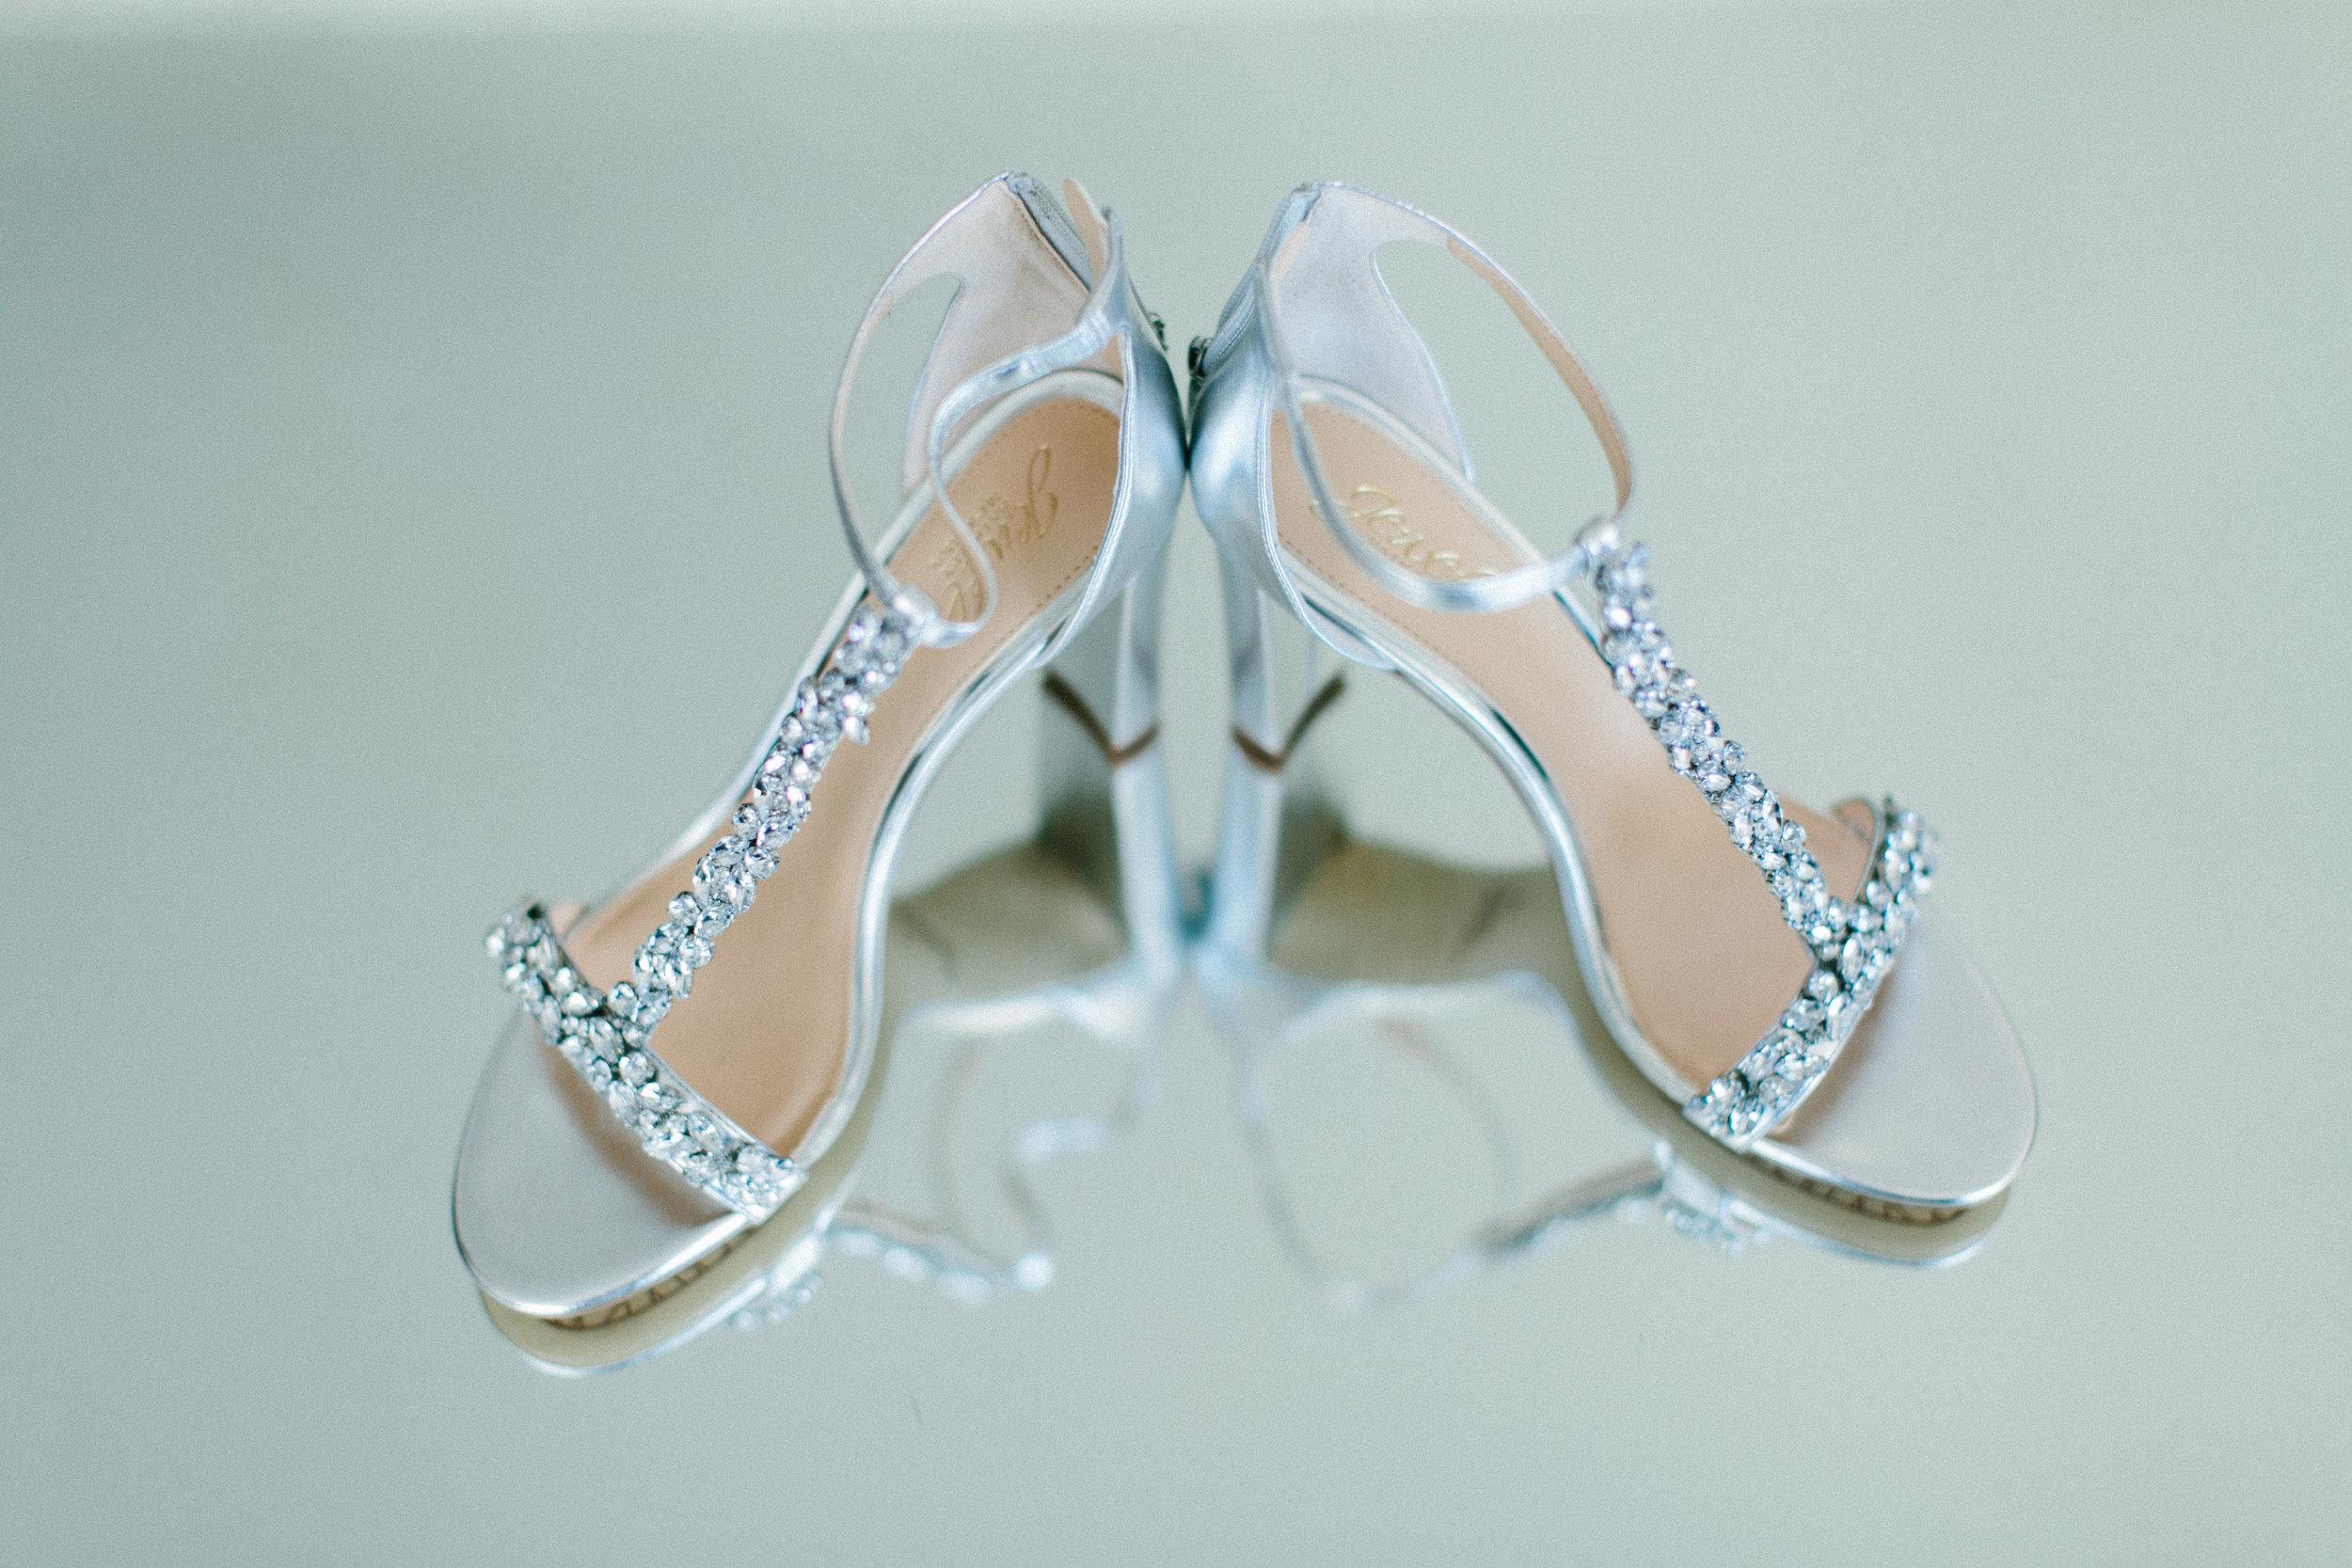 jett-walker-photography-birmingham-wedding.jpg